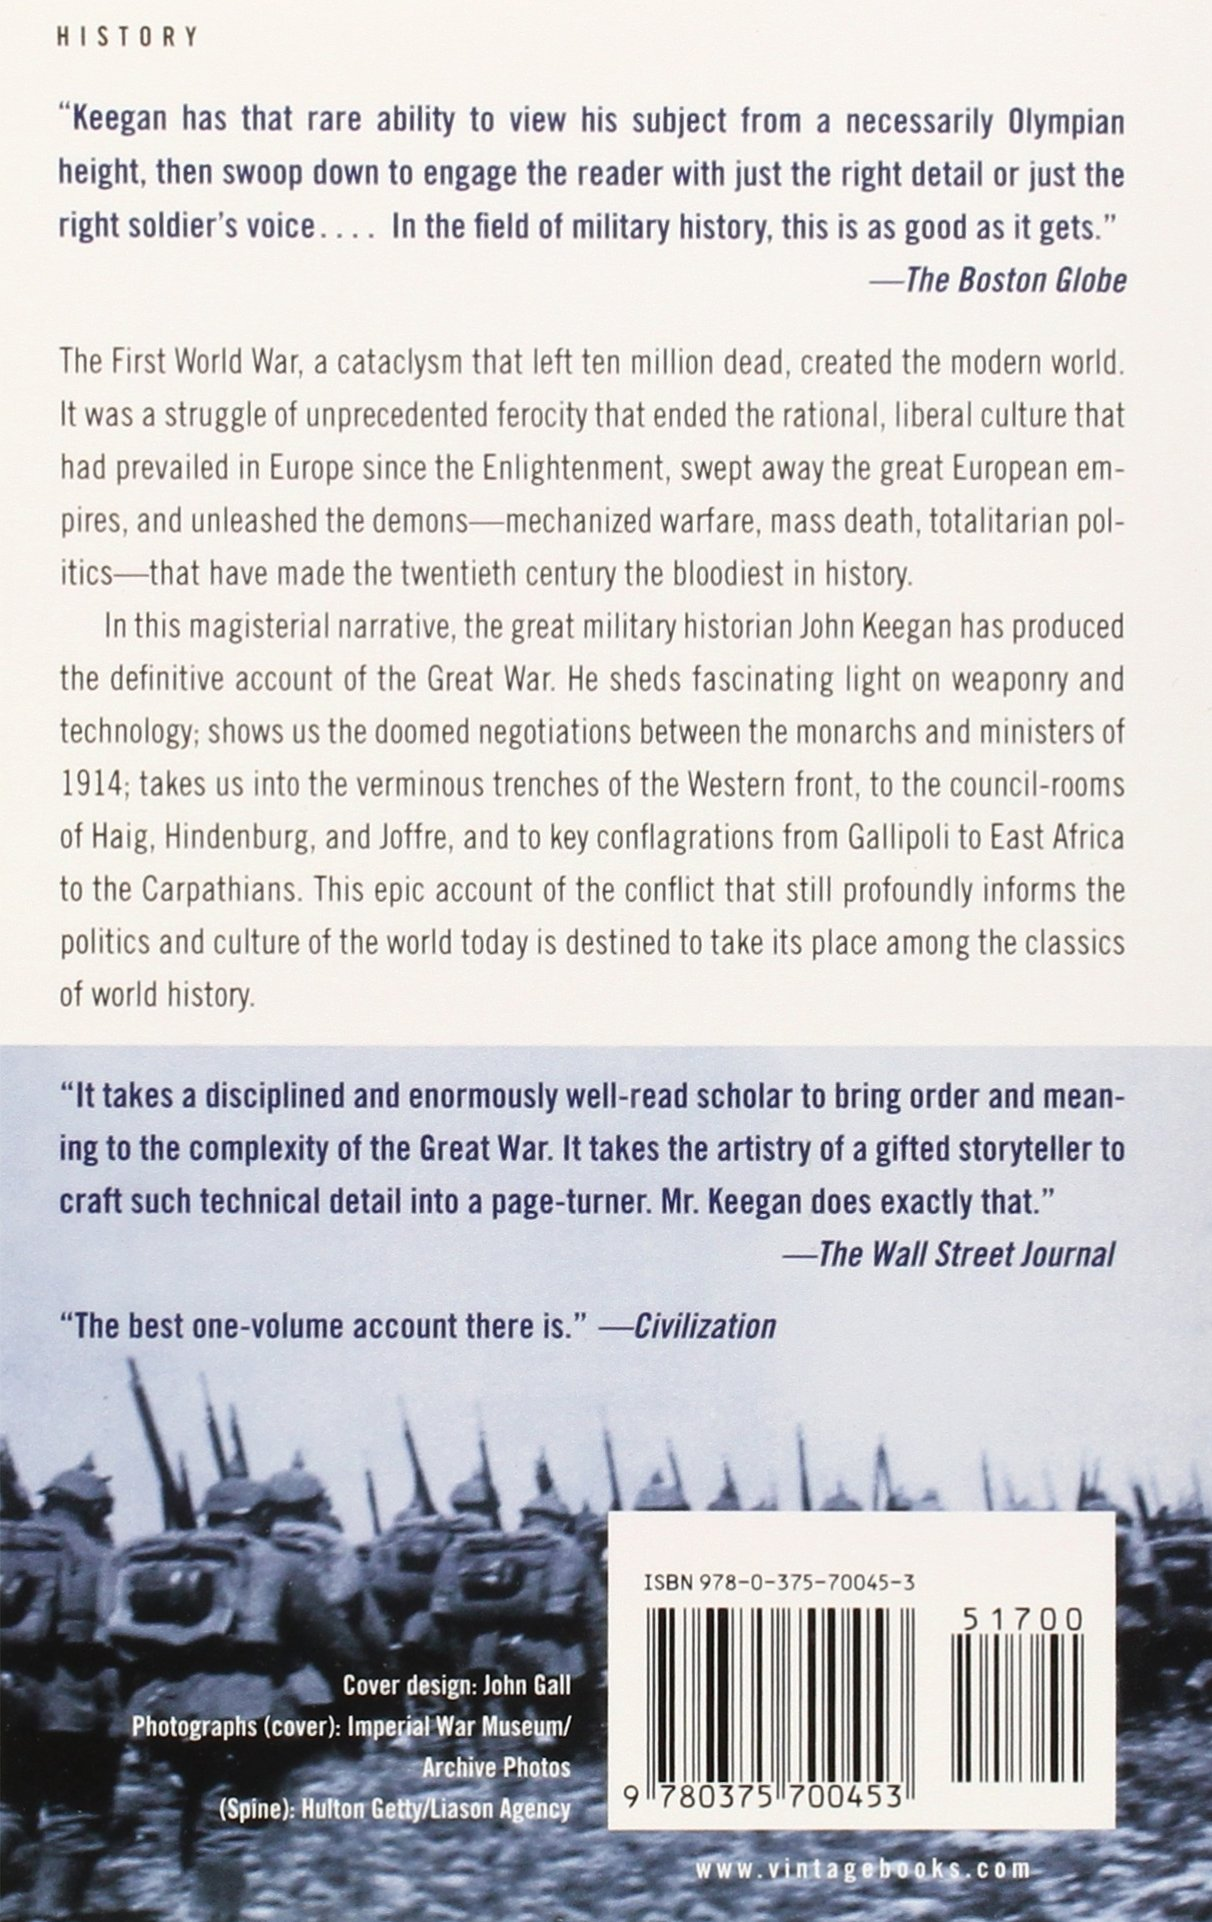 The First World War: Amazon.es: John Keegan: Libros en idiomas extranjeros